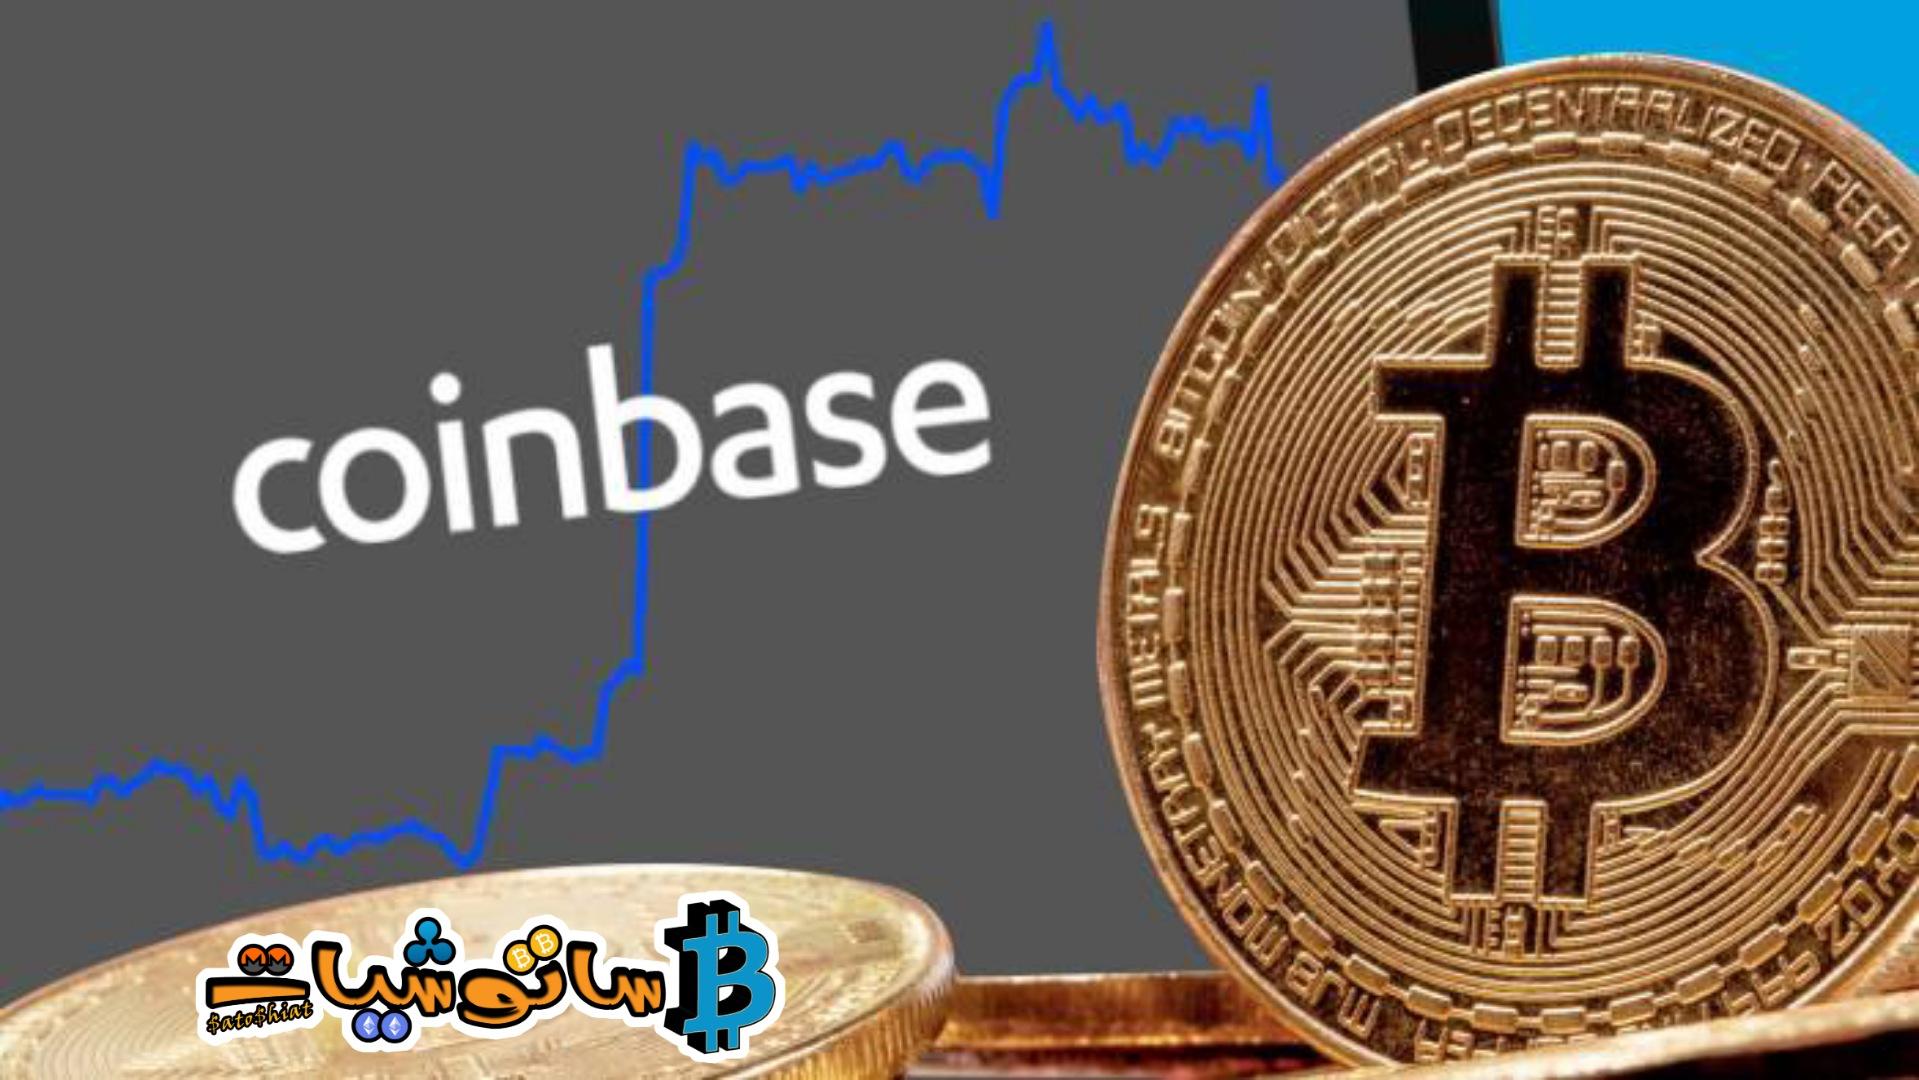 تعلن Coinbase عن نيتها جمع 1.25 مليار دولار